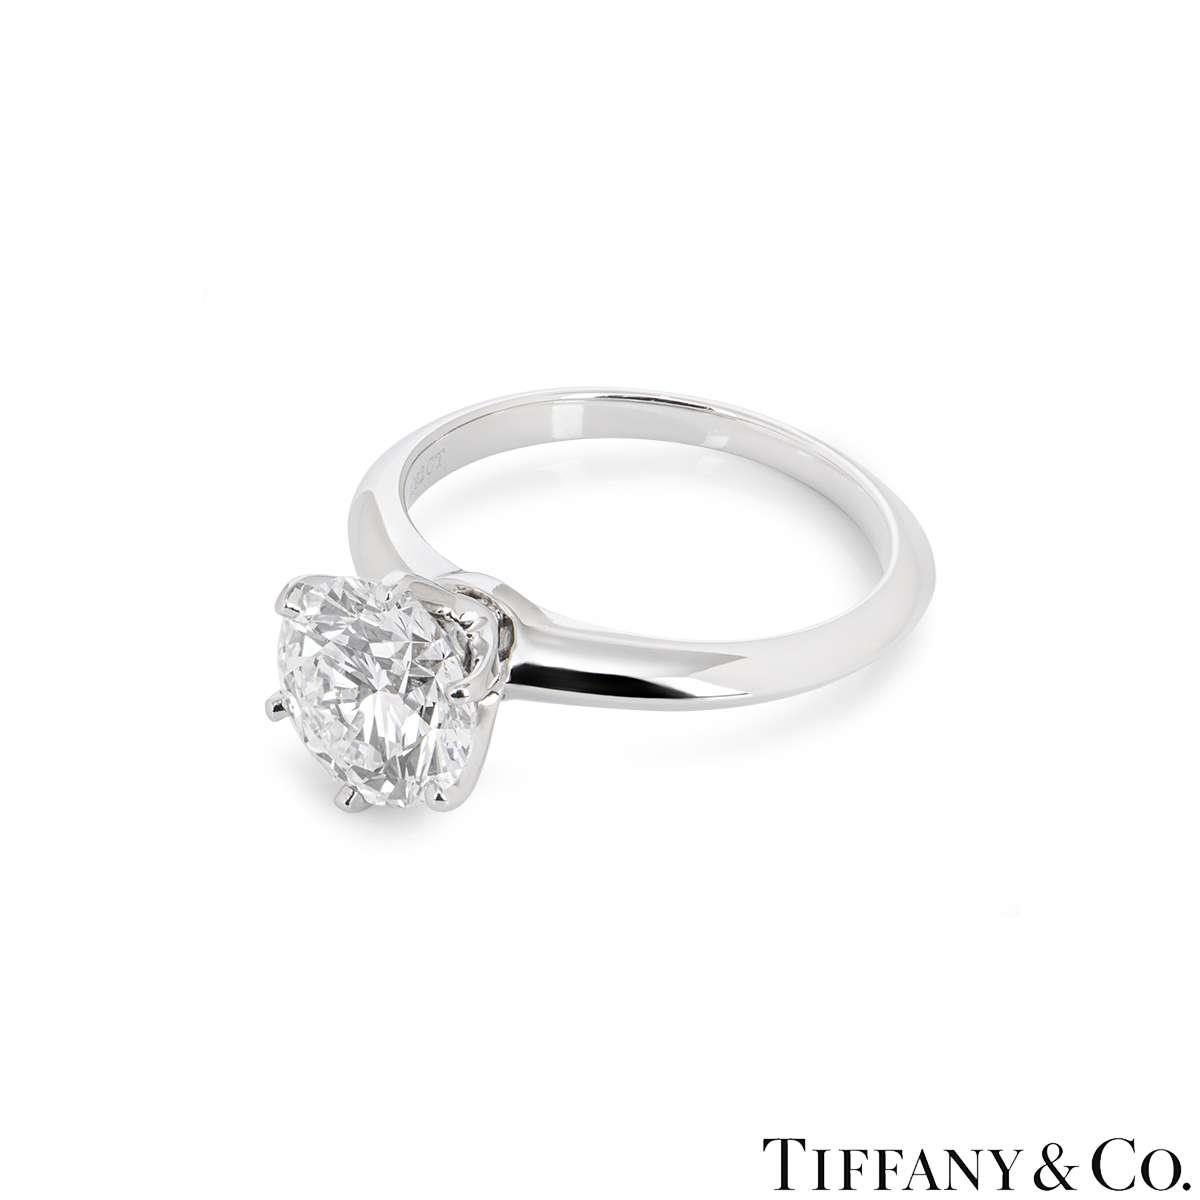 Tiffany & Co. Platinum Diamond Setting Ring 2.02ct D/VS1